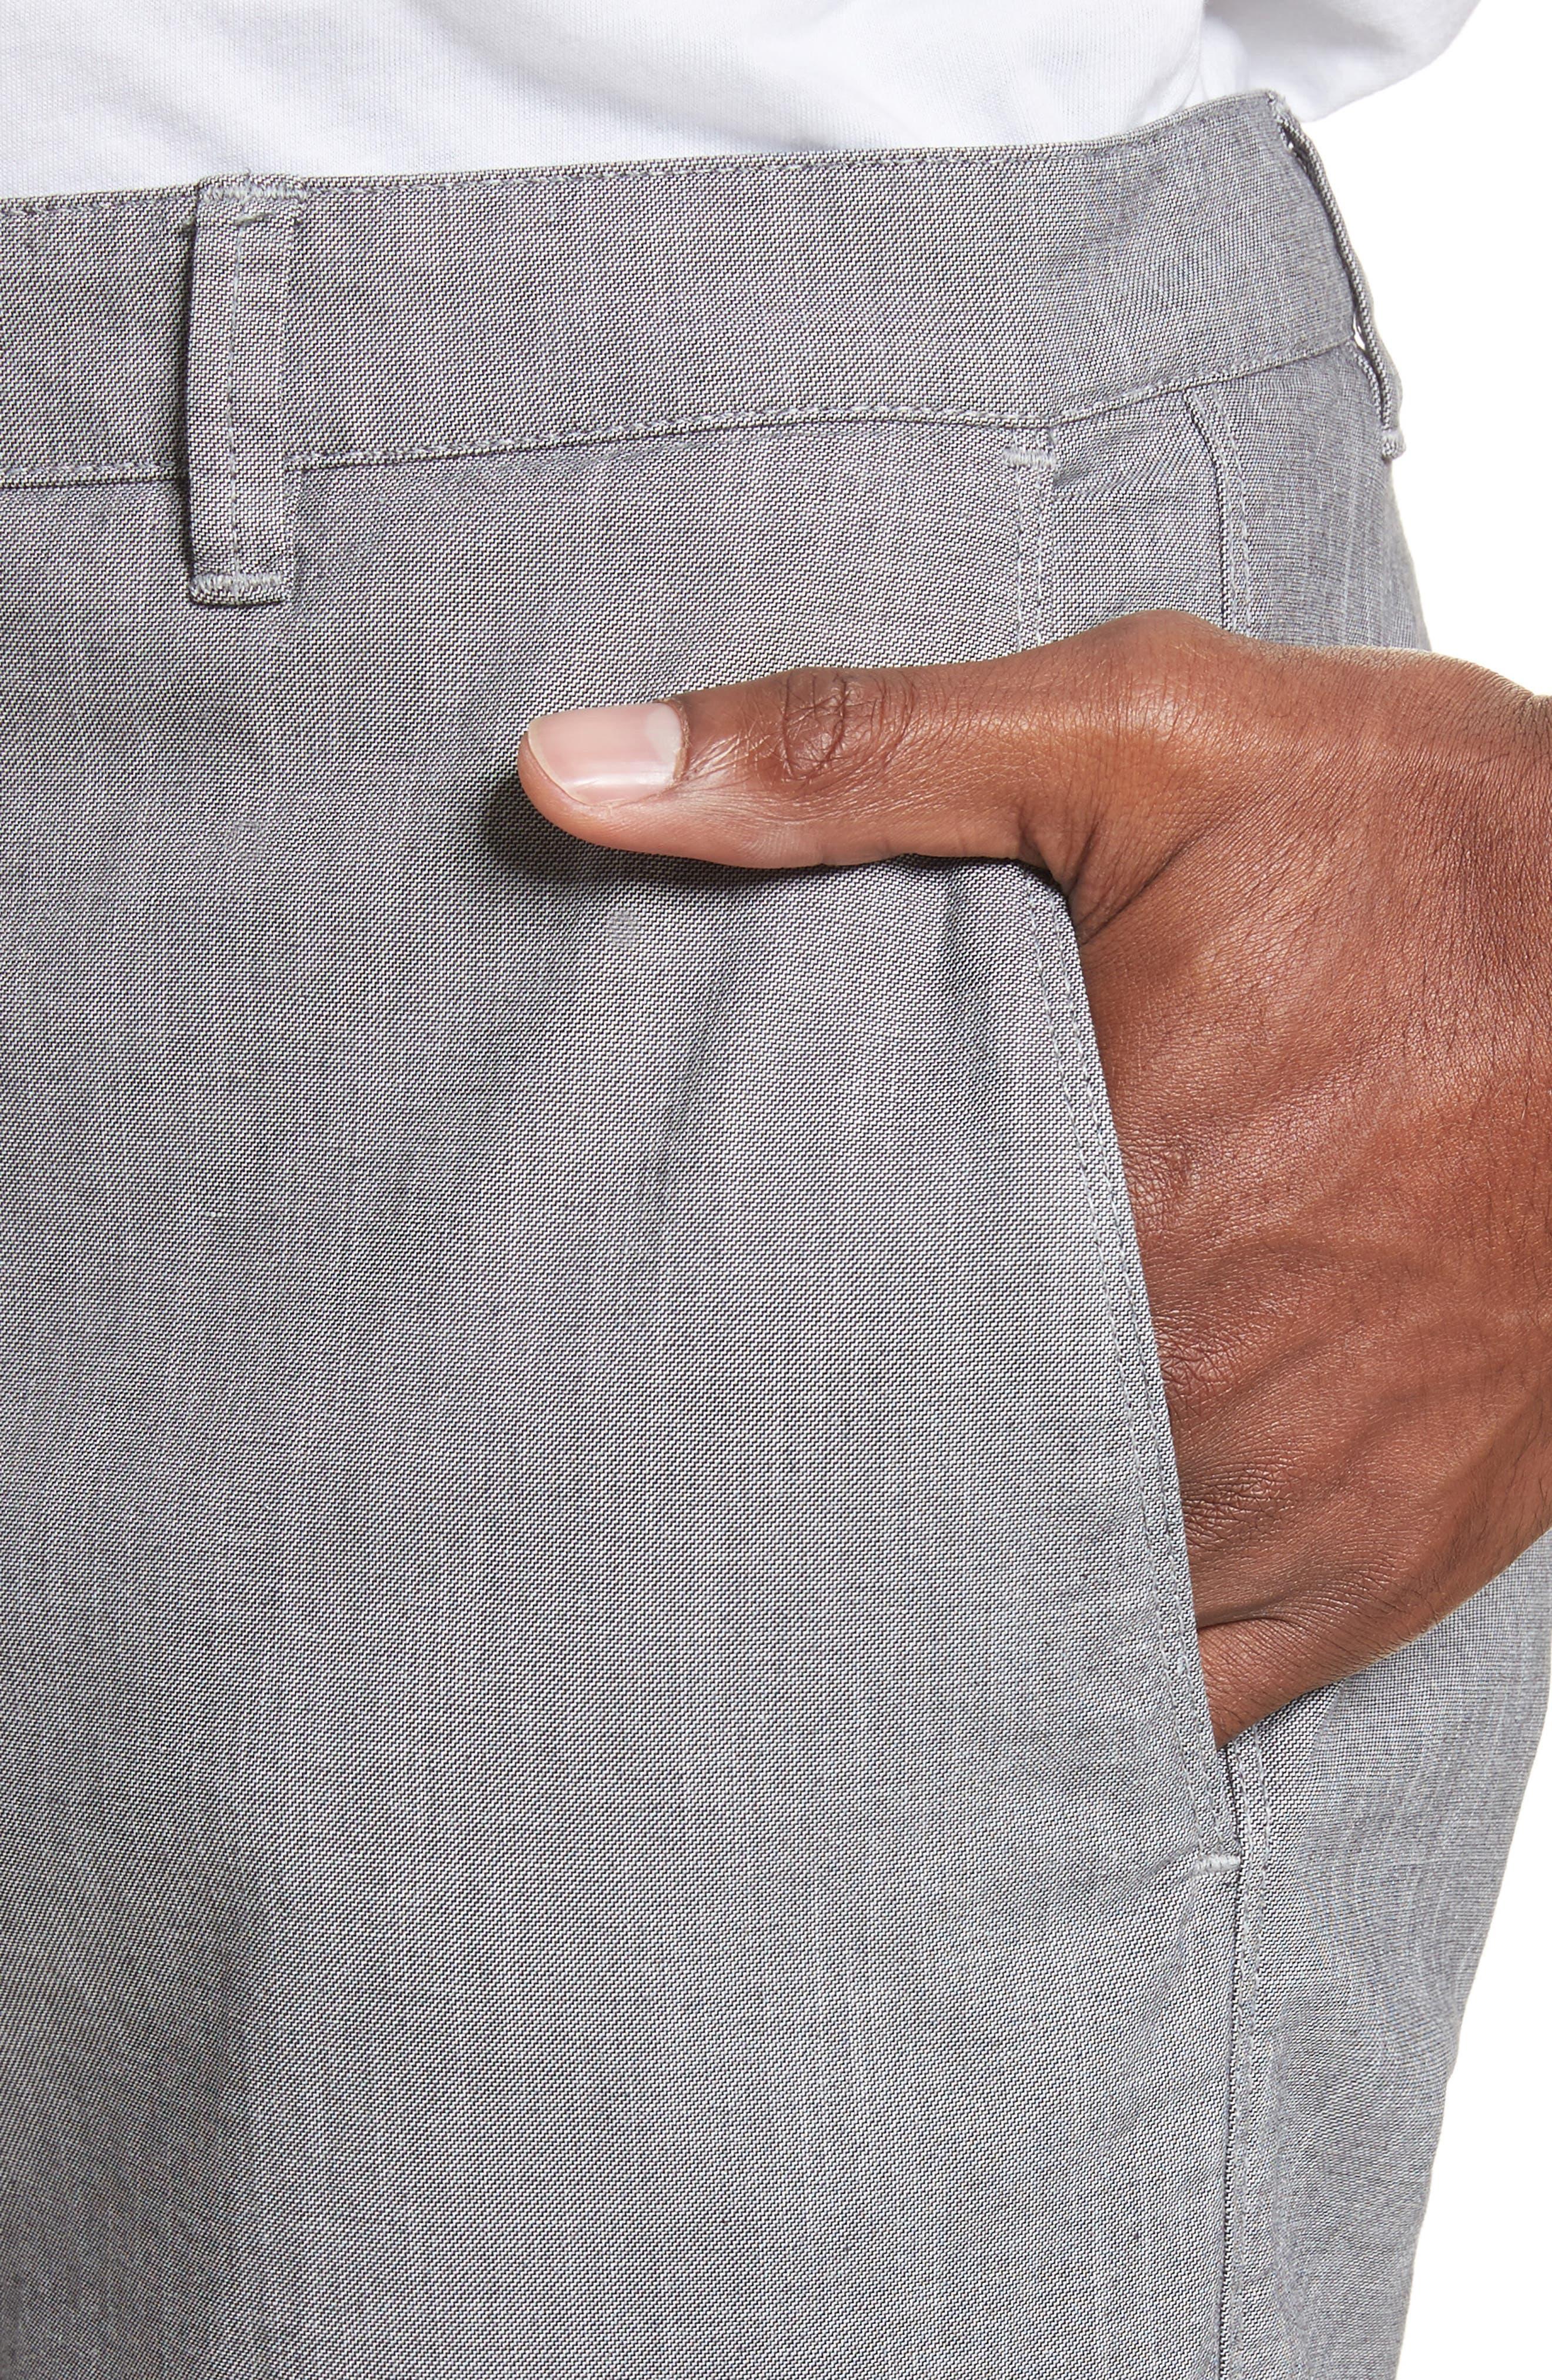 French Pocket Stretch Straight Leg Pants,                             Alternate thumbnail 5, color,                             020